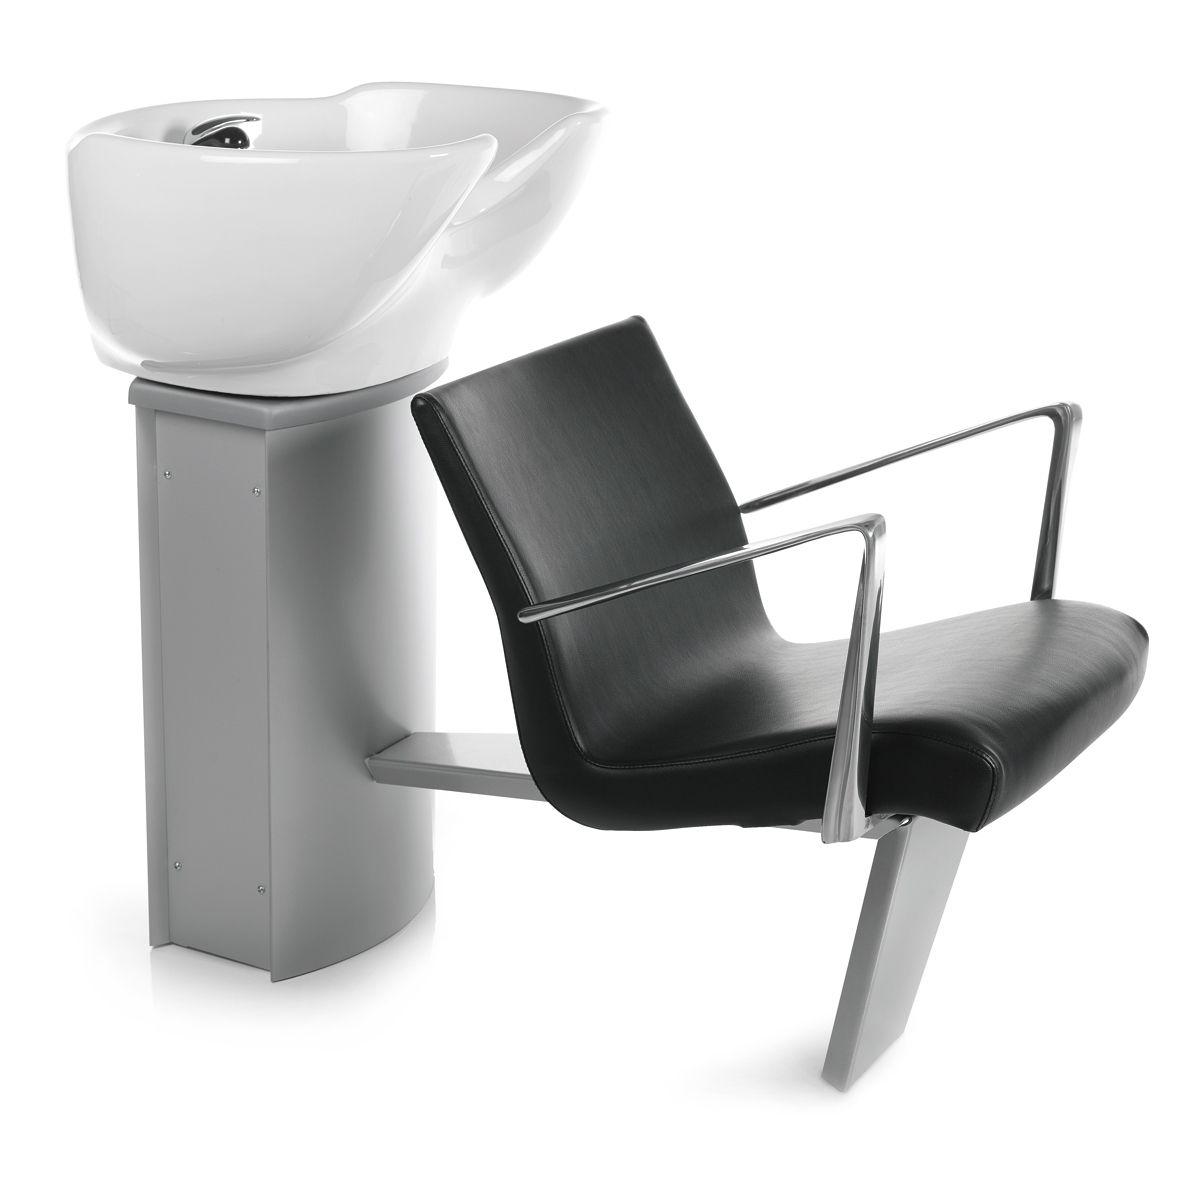 Wash Inn Ecoblack - Shampoo Bowls | Salon Equipment and Beauty Furniture | GCWI050EB